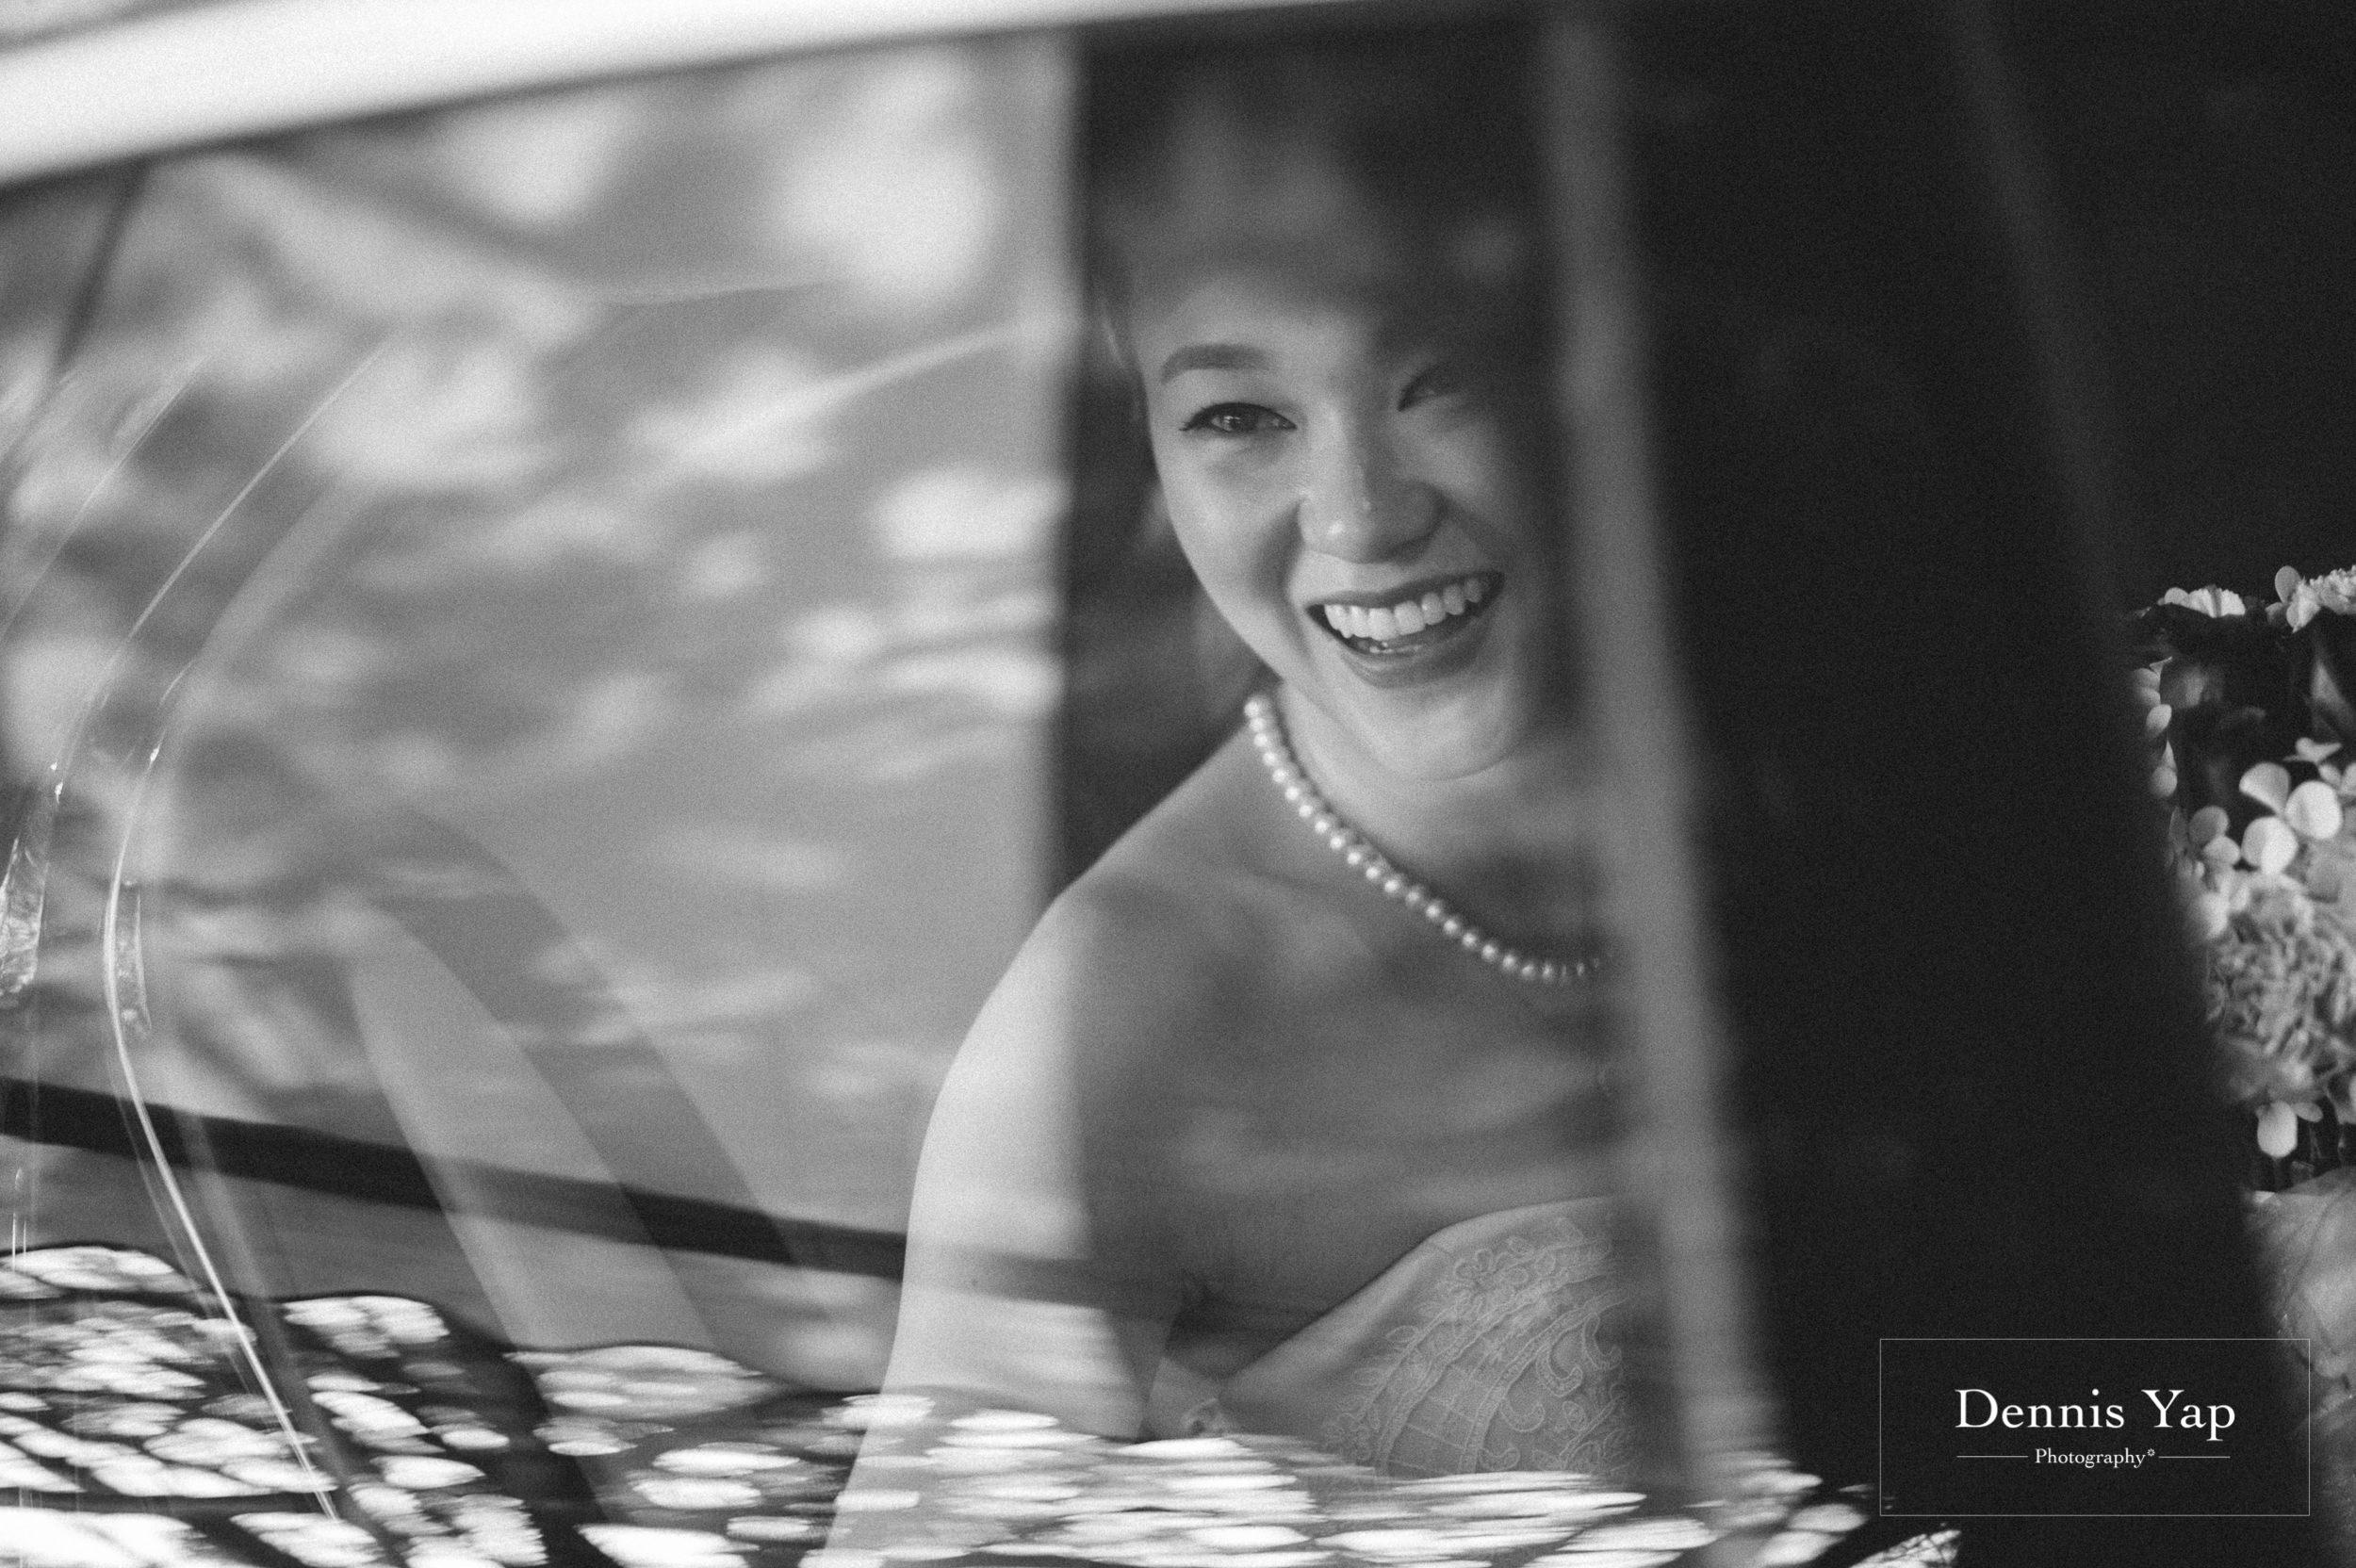 ethan juli wedding day gate crash wedding party dennis yap photography colors-31.jpg